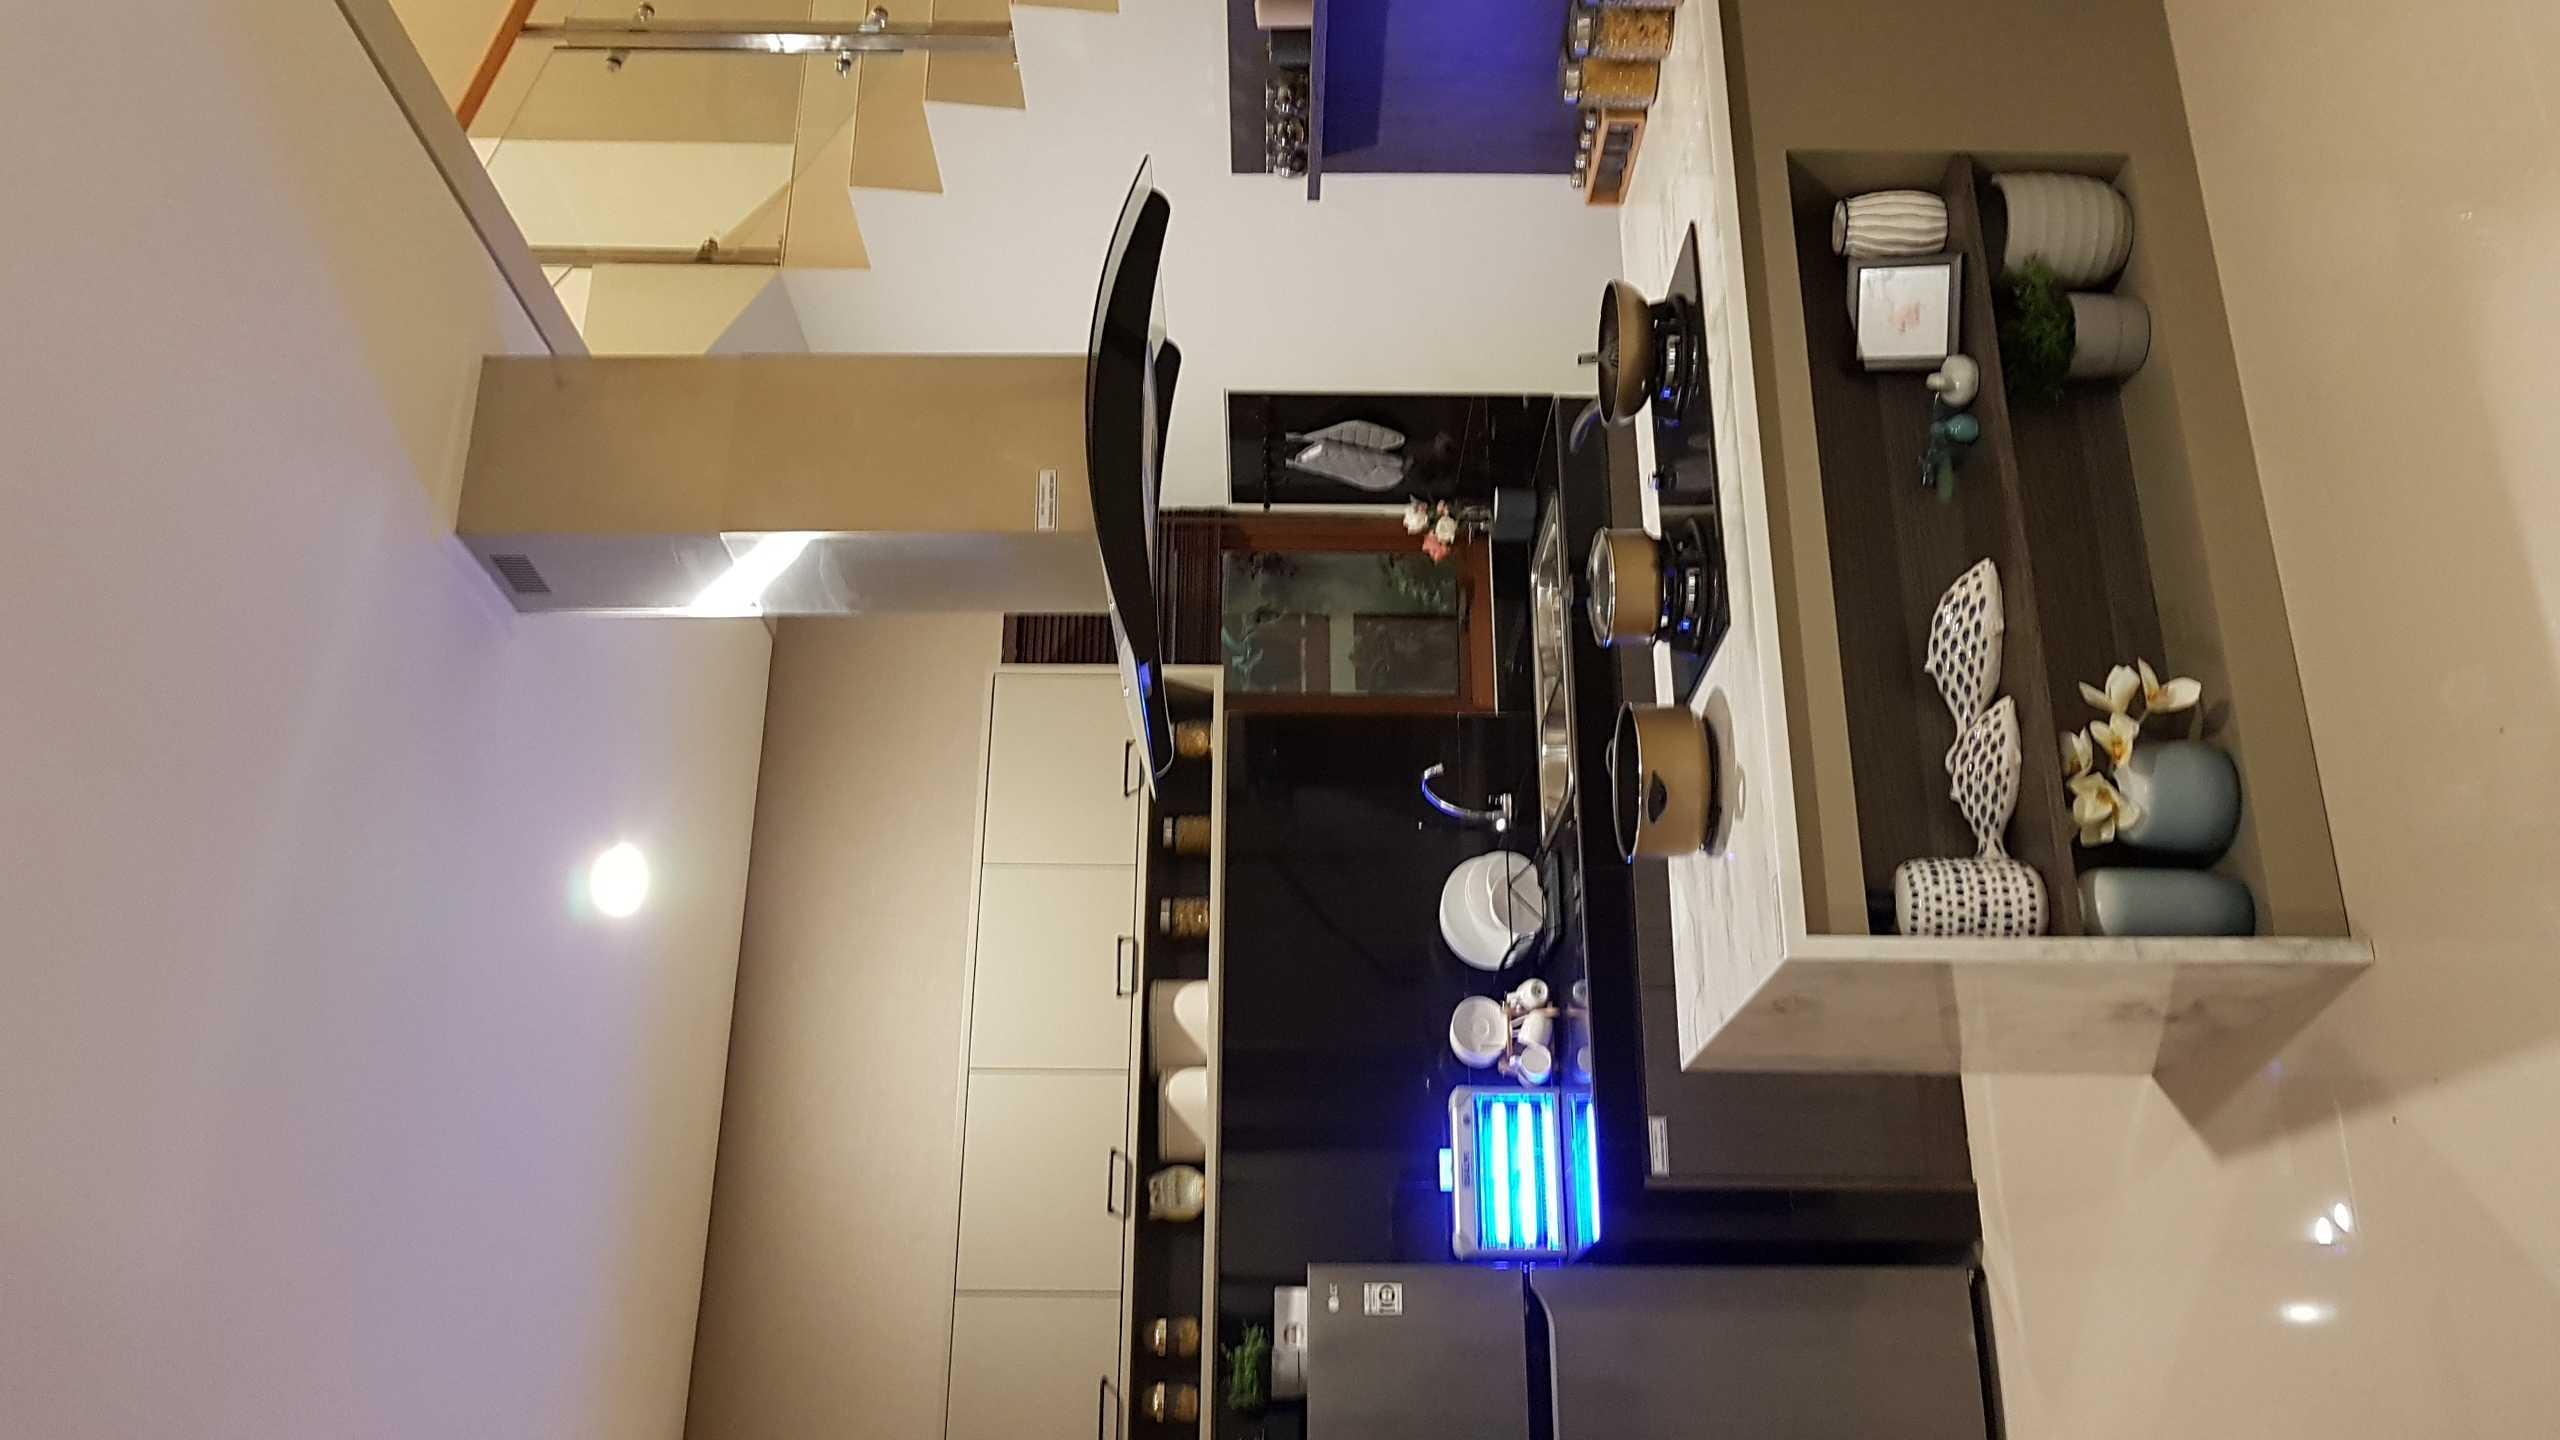 Triplus Homes Premier Estate Cibubur, Kec. Ciracas, Kota Jakarta Timur, Daerah Khusus Ibukota Jakarta, Indonesia Cibubur, Kec. Ciracas, Kota Jakarta Timur, Daerah Khusus Ibukota Jakarta, Indonesia Triplus-Homes-Premier-Estate   104000